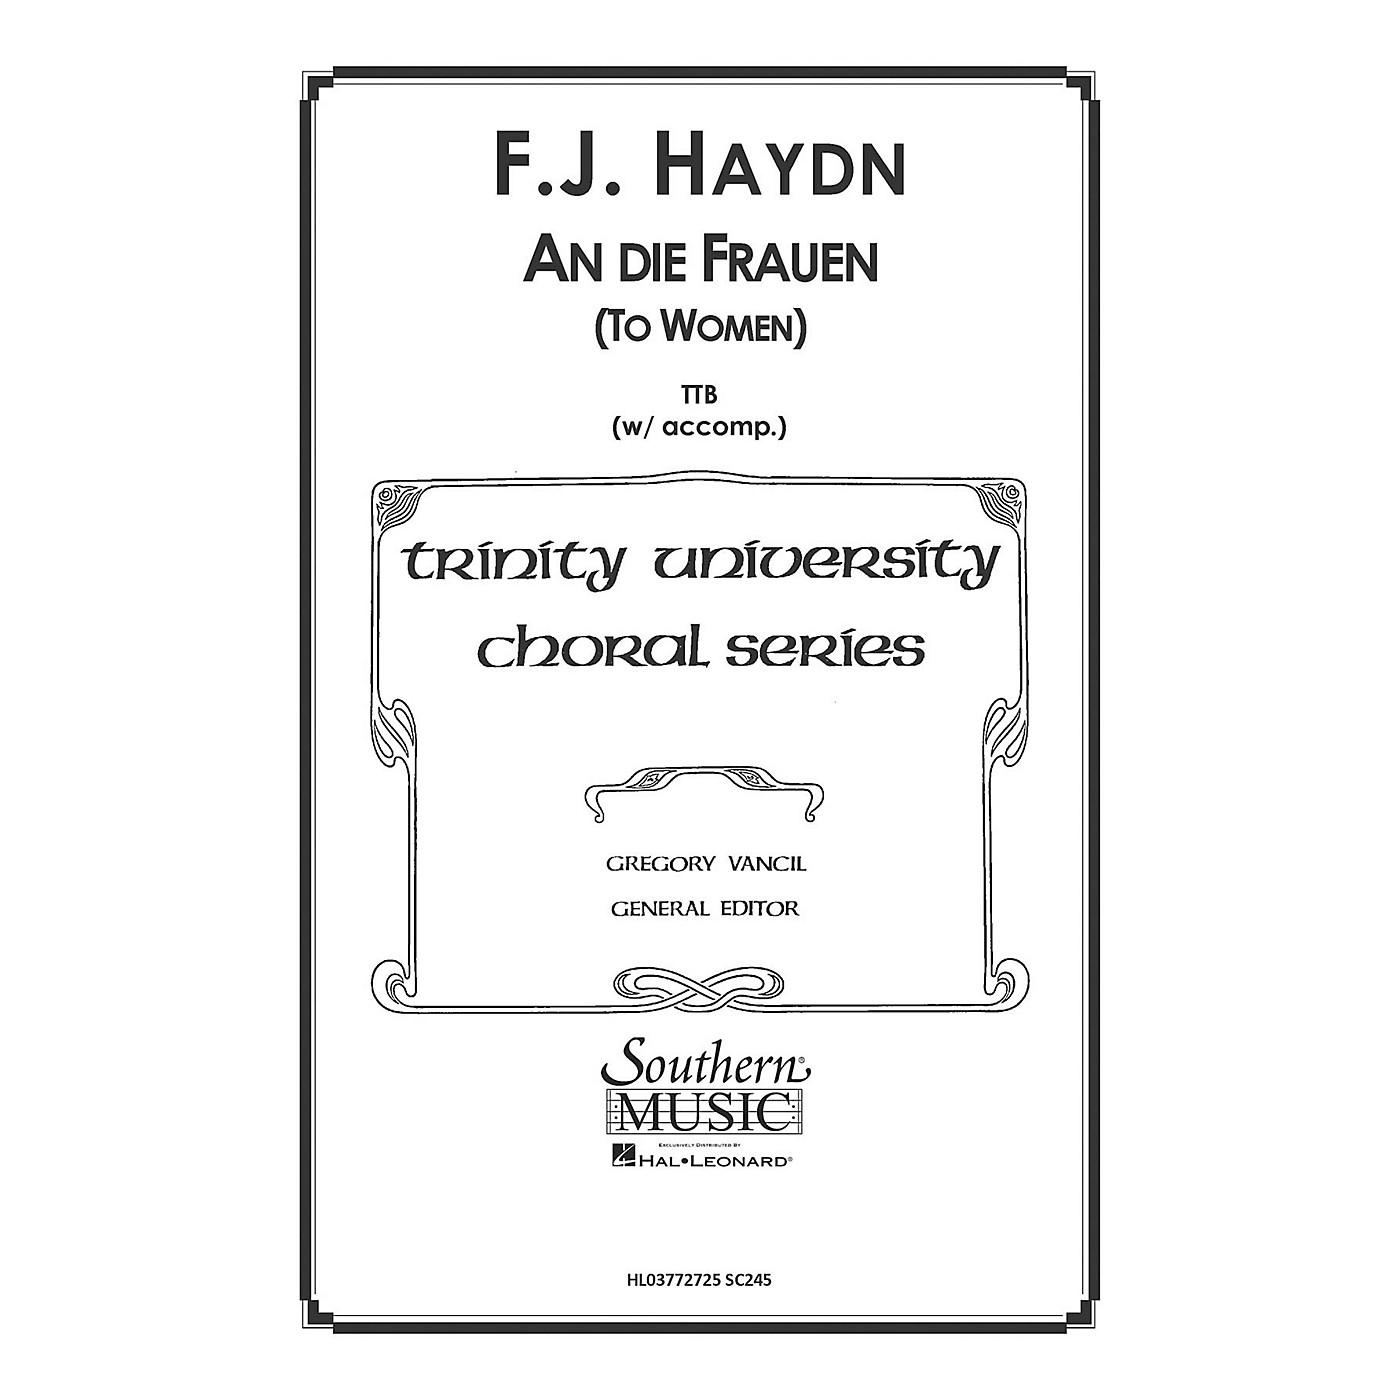 Hal Leonard To Women ( An Die Frauen) (Choral Music/Octavo Secular Ttb) TTB Arranged by Gregory Vancil thumbnail